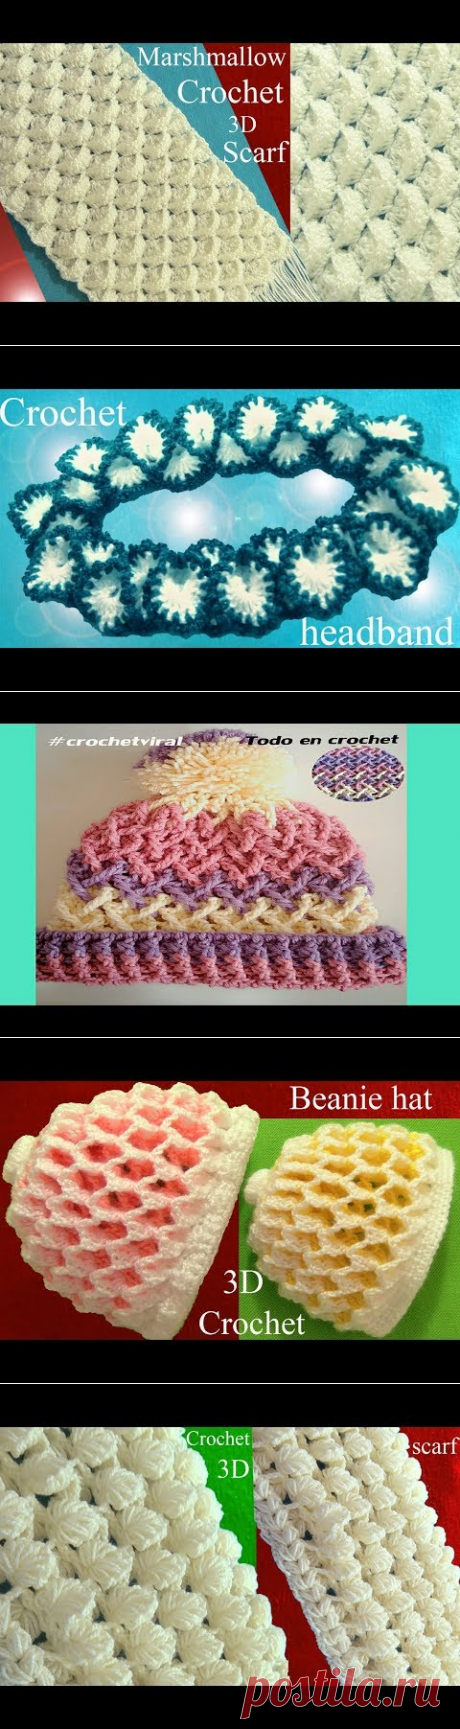 Crochet en 3D punto macarons marshmallow de colores para almohadones cojines tejido tallermanualper - YouTube